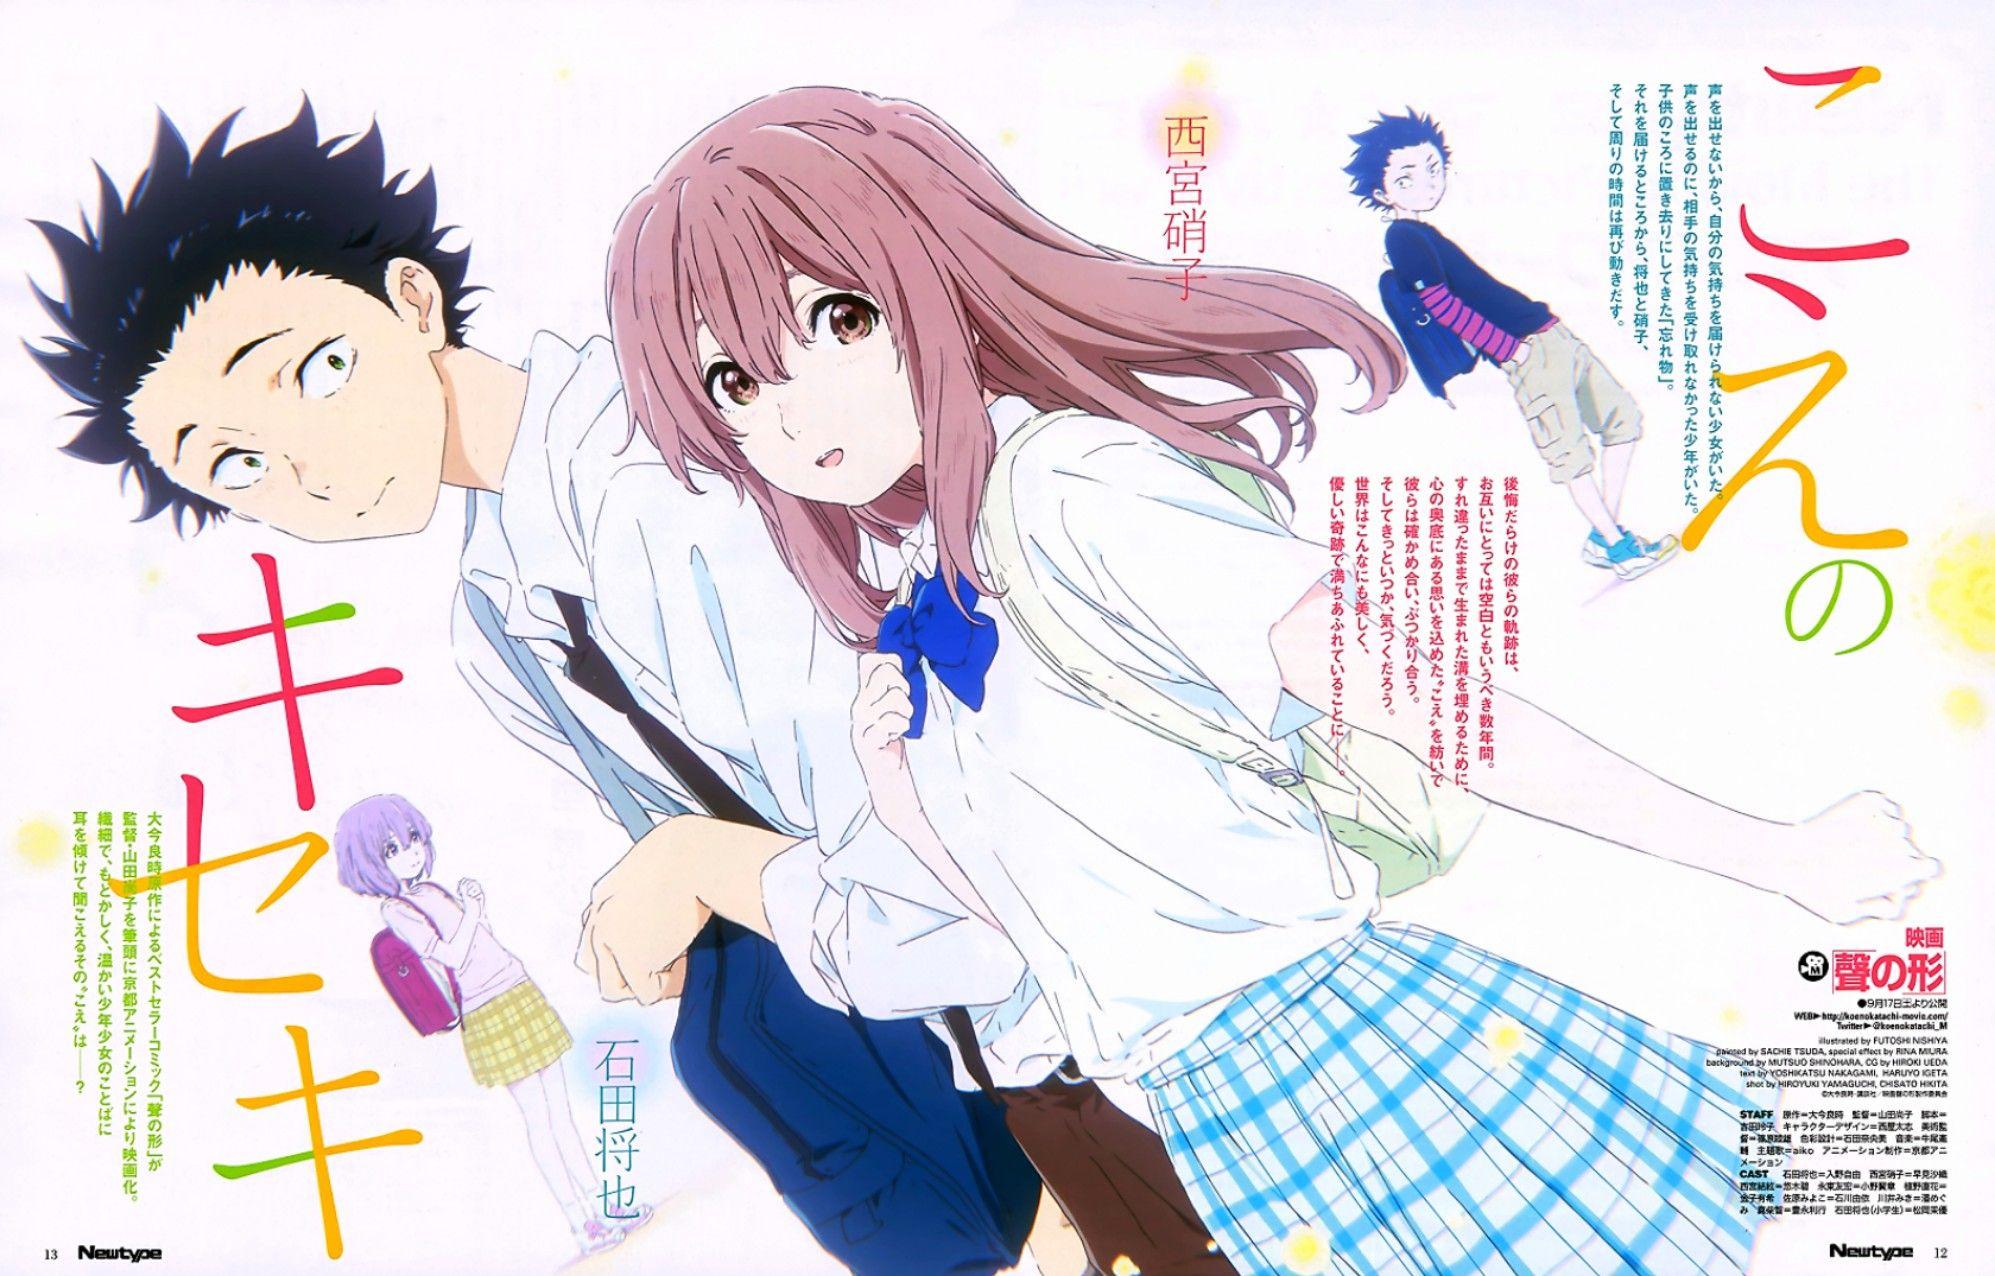 A Silent Voice / Koe no Katachi Animasi, Poster, Gambar